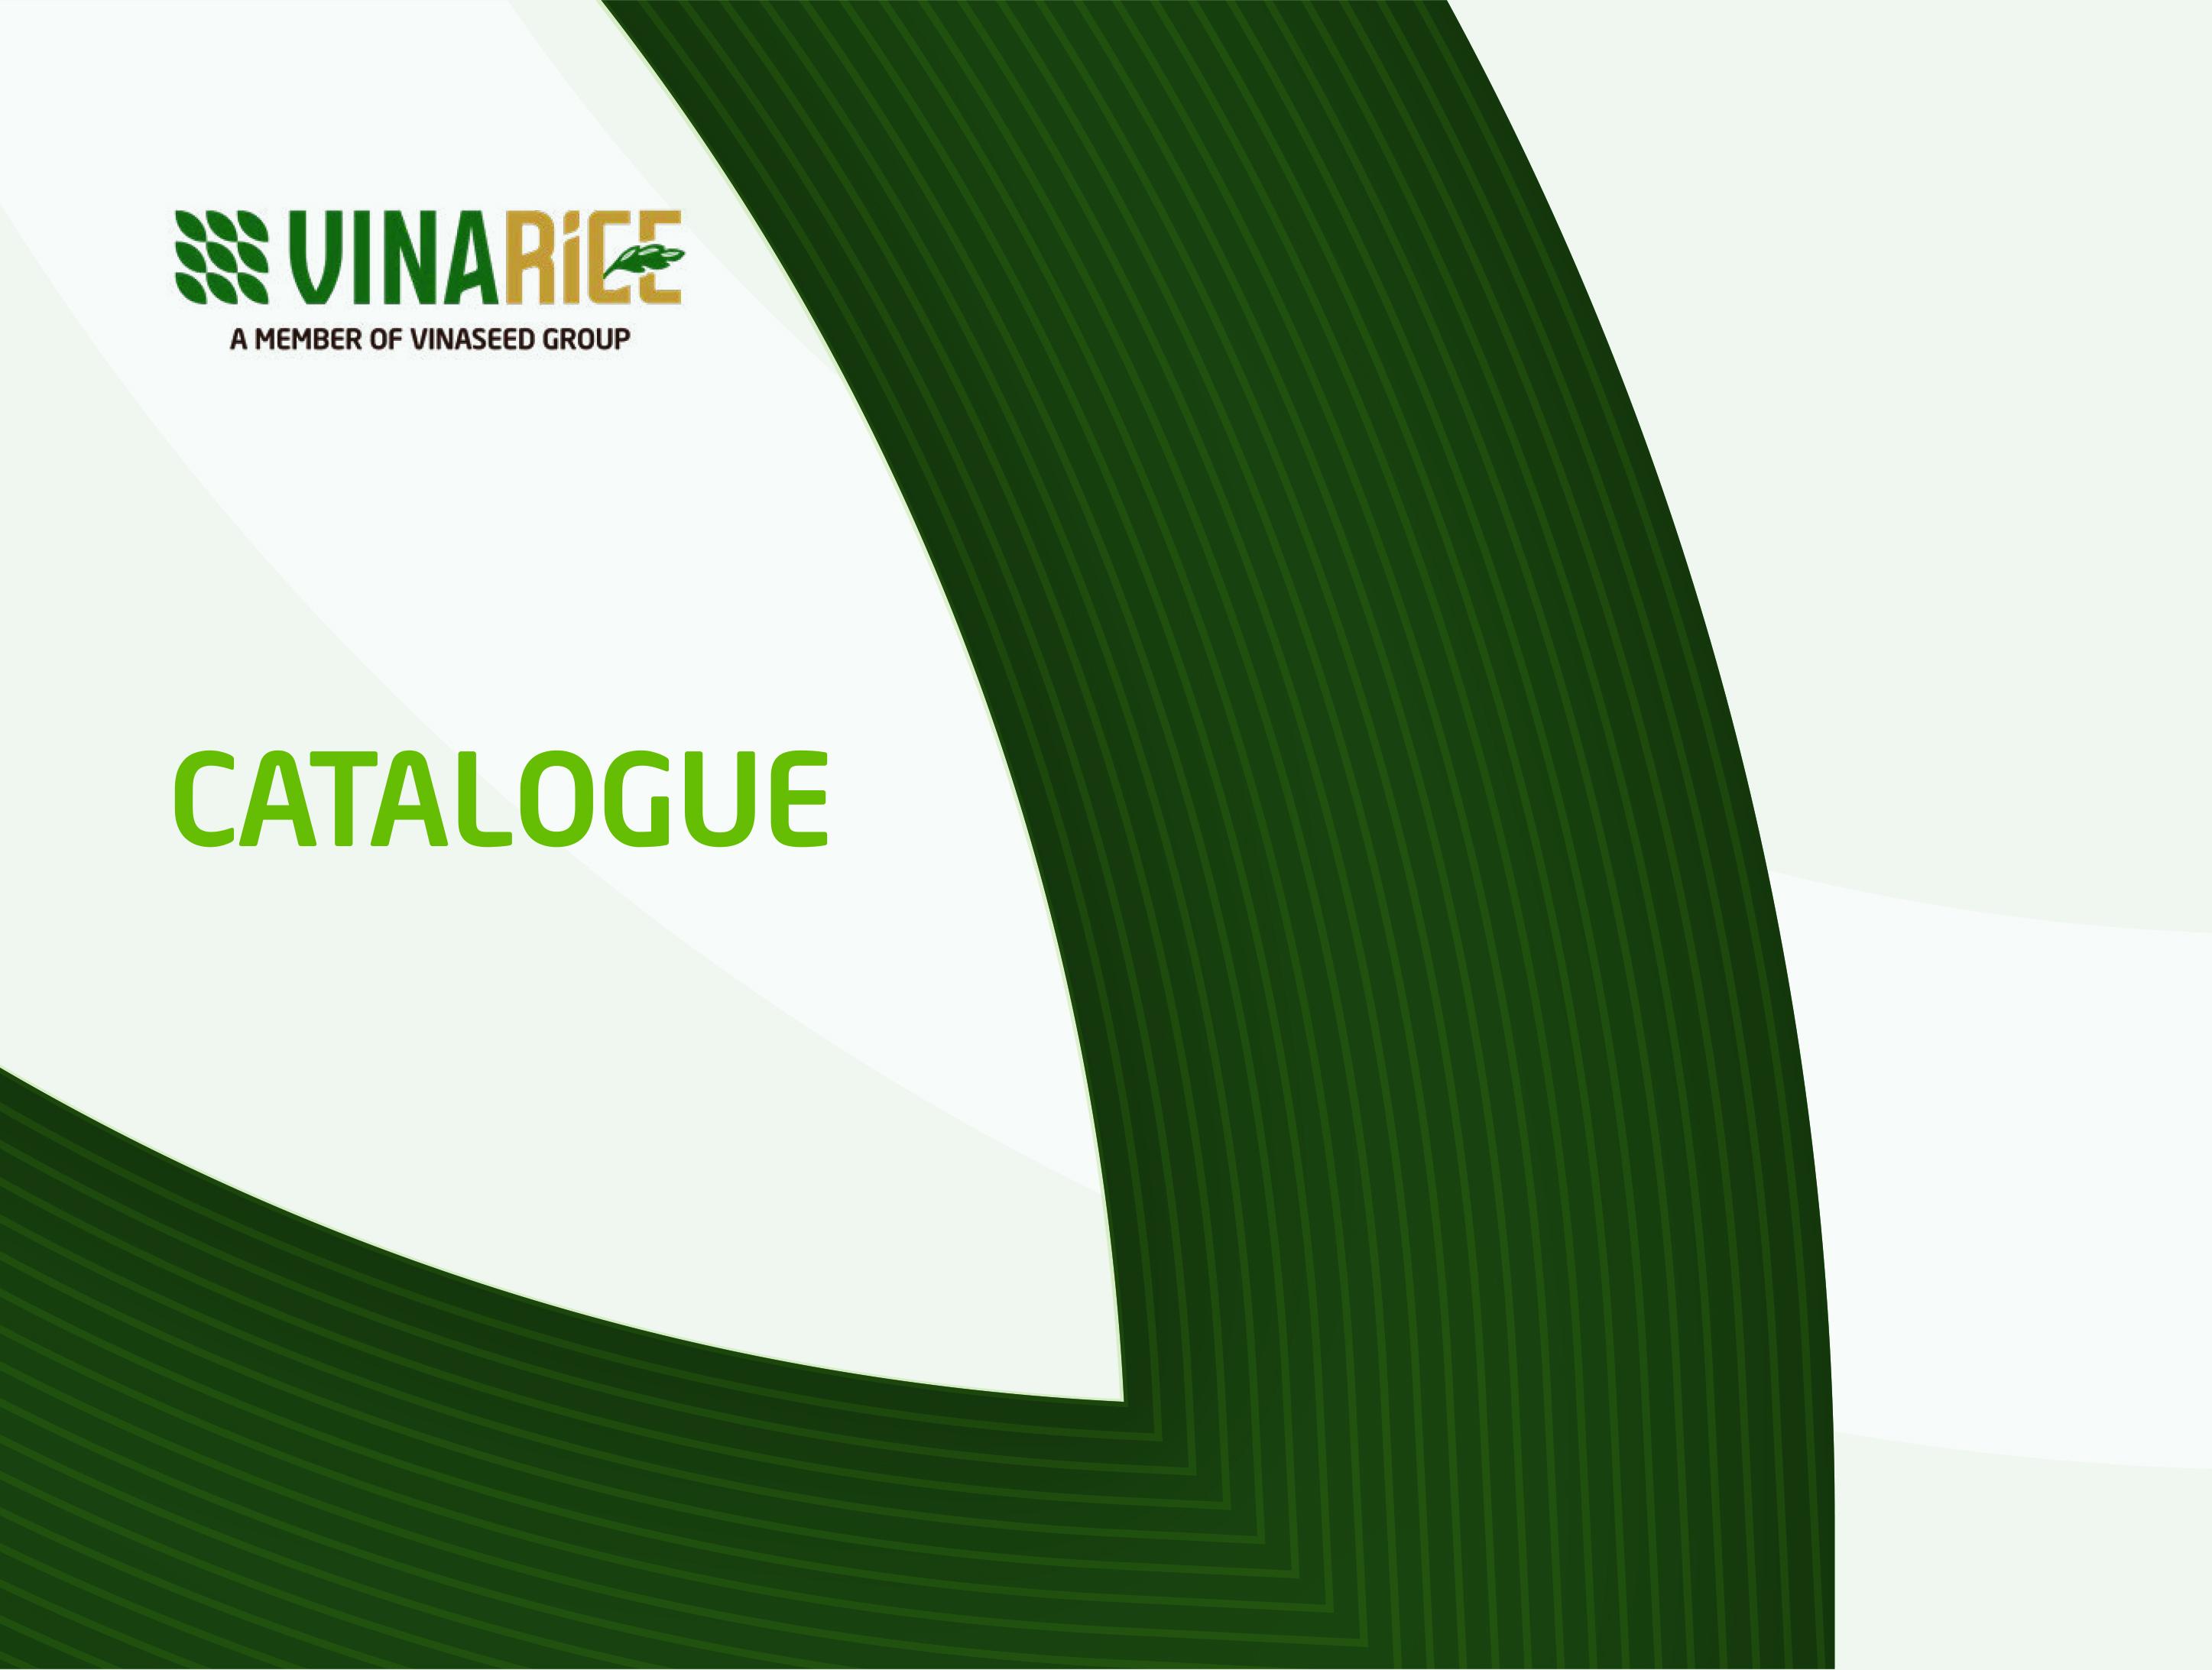 Vinarice Catalogue